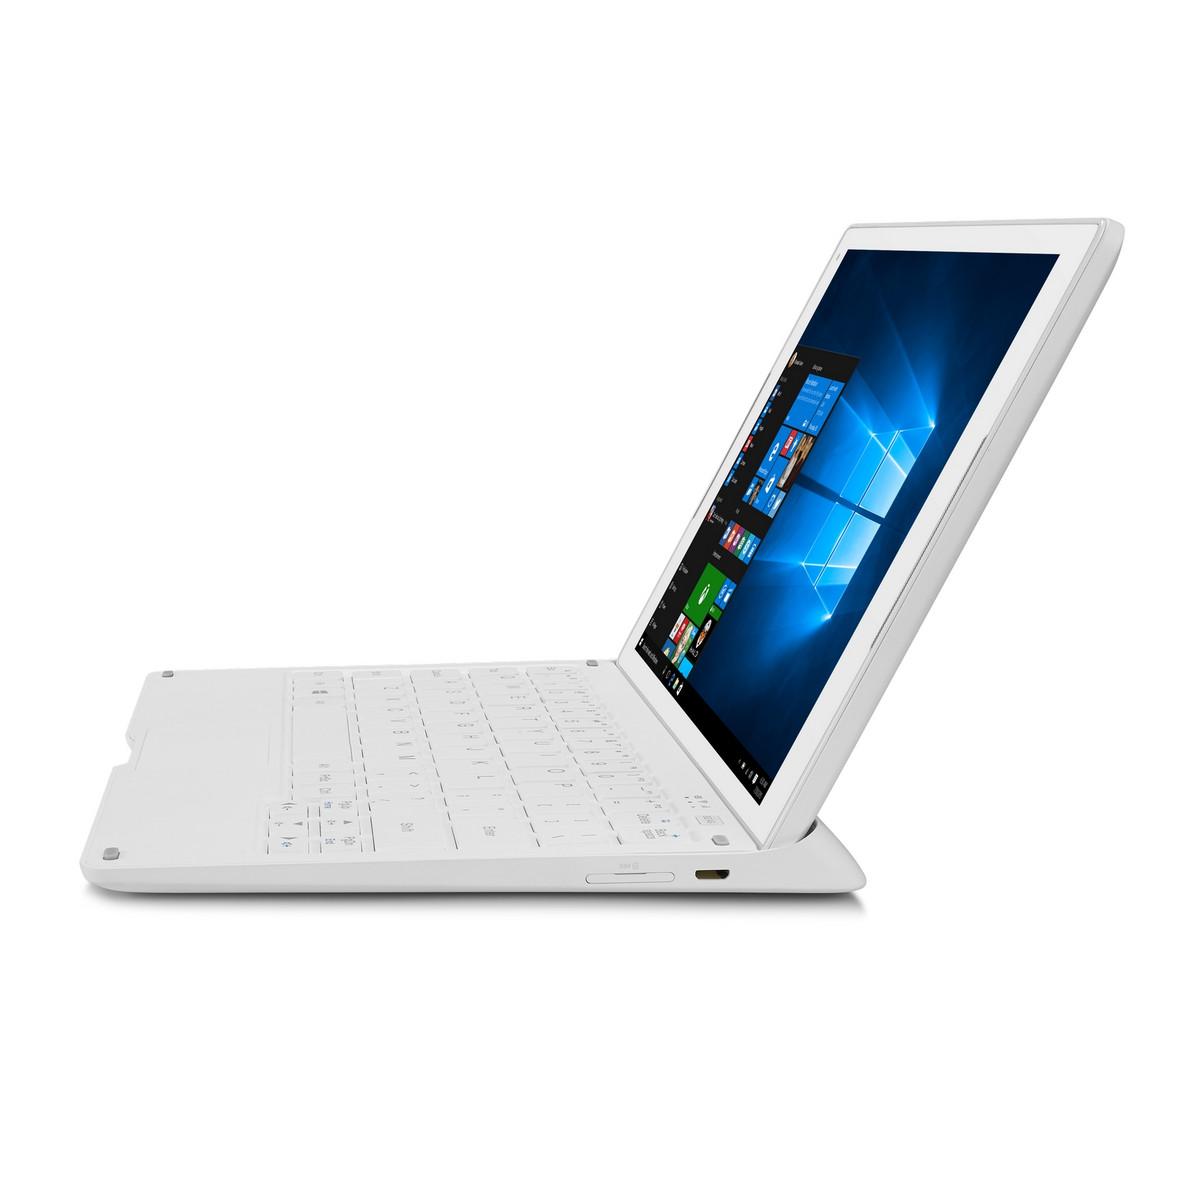 Alcatel Plus 10 - Notebookcheck.net External Reviews 5324336d831e